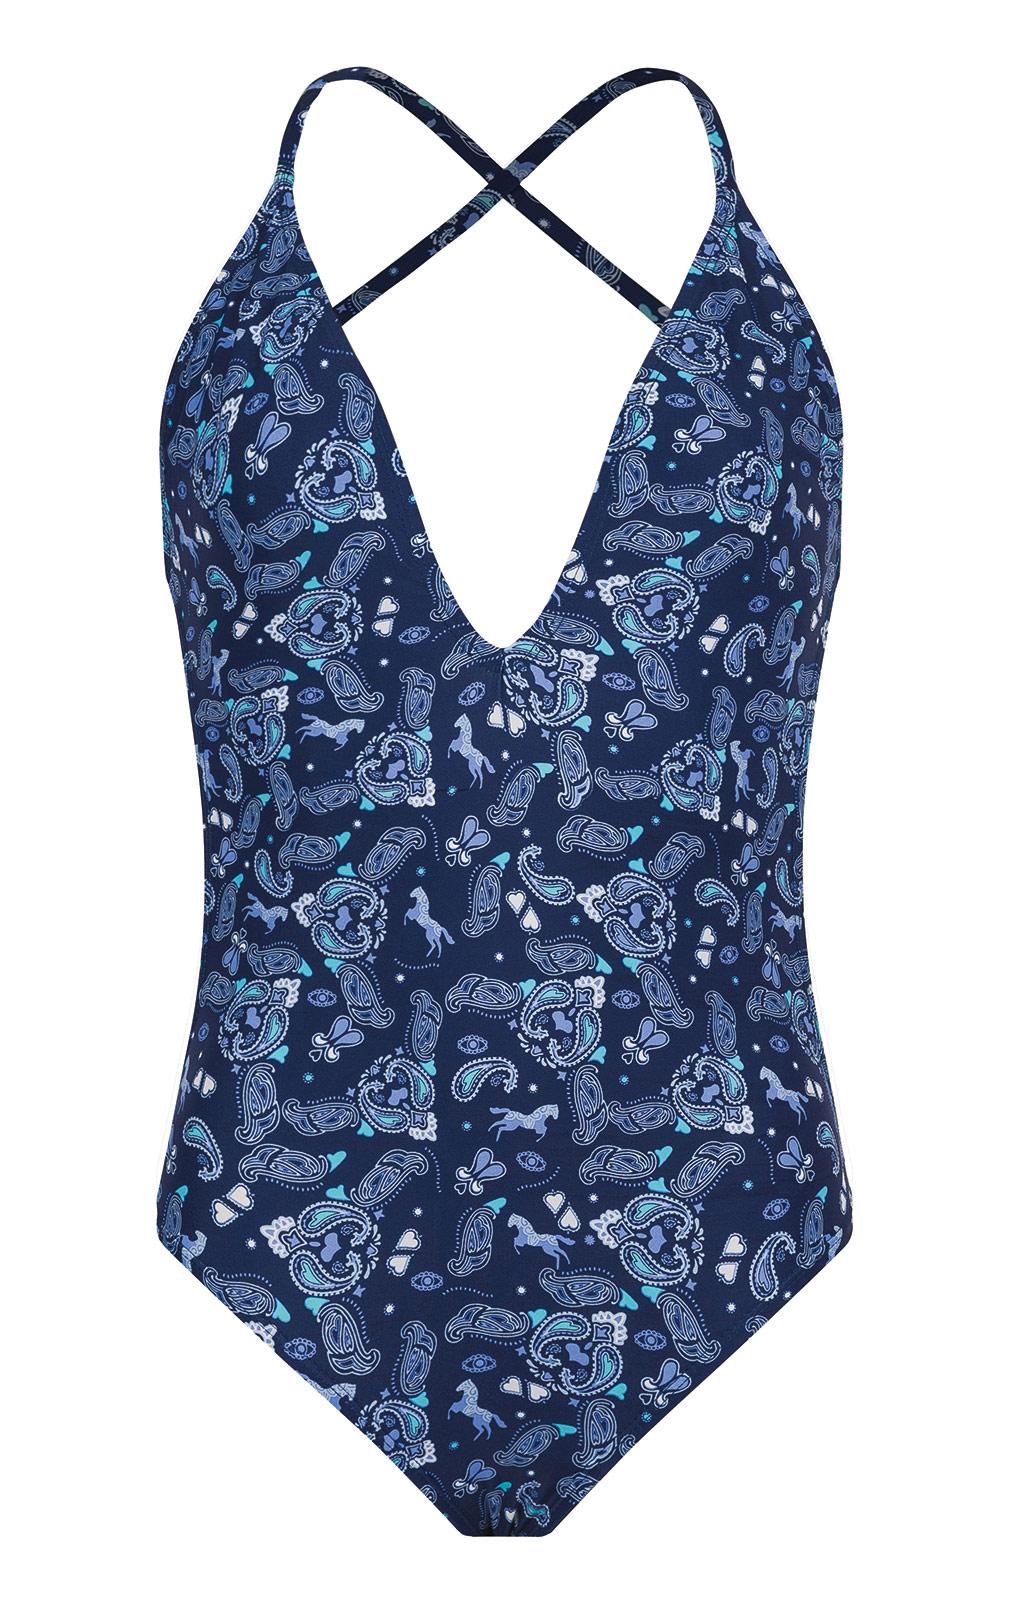 64314e9836148 Blue Bandana One-piece V-neck Swimsuit - Bettyswim Navy - Amenapih